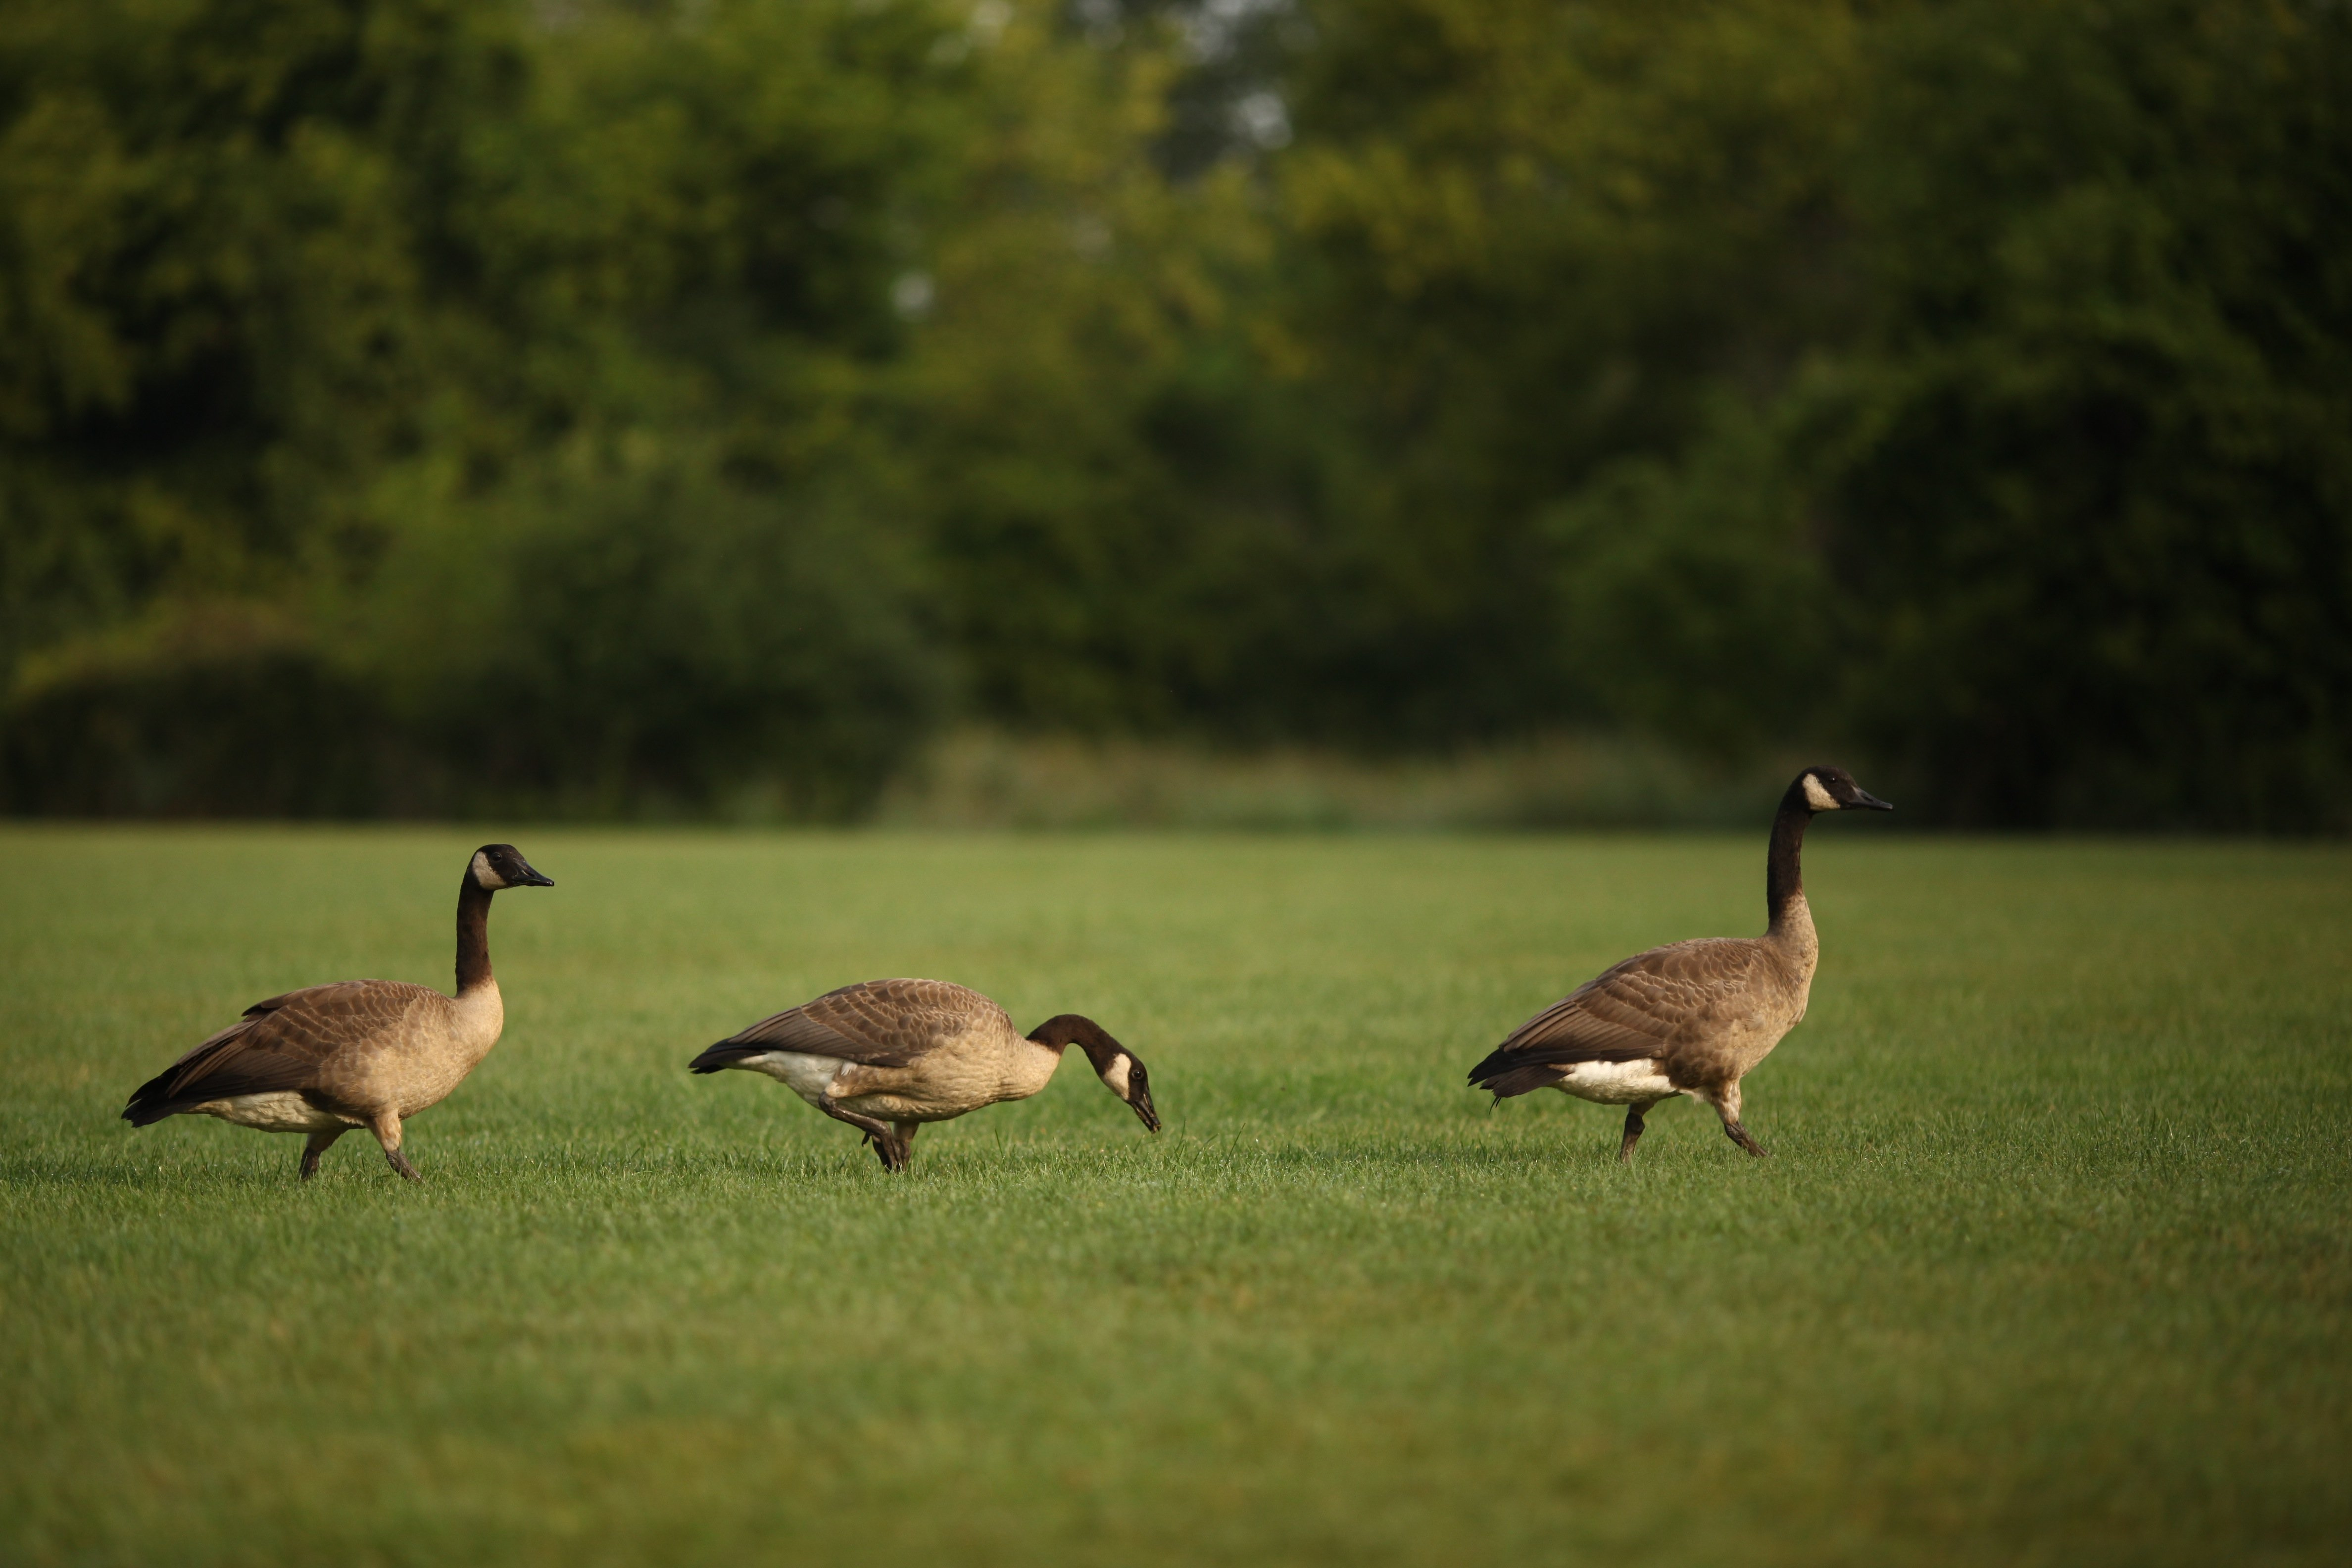 Ducks @ meridian